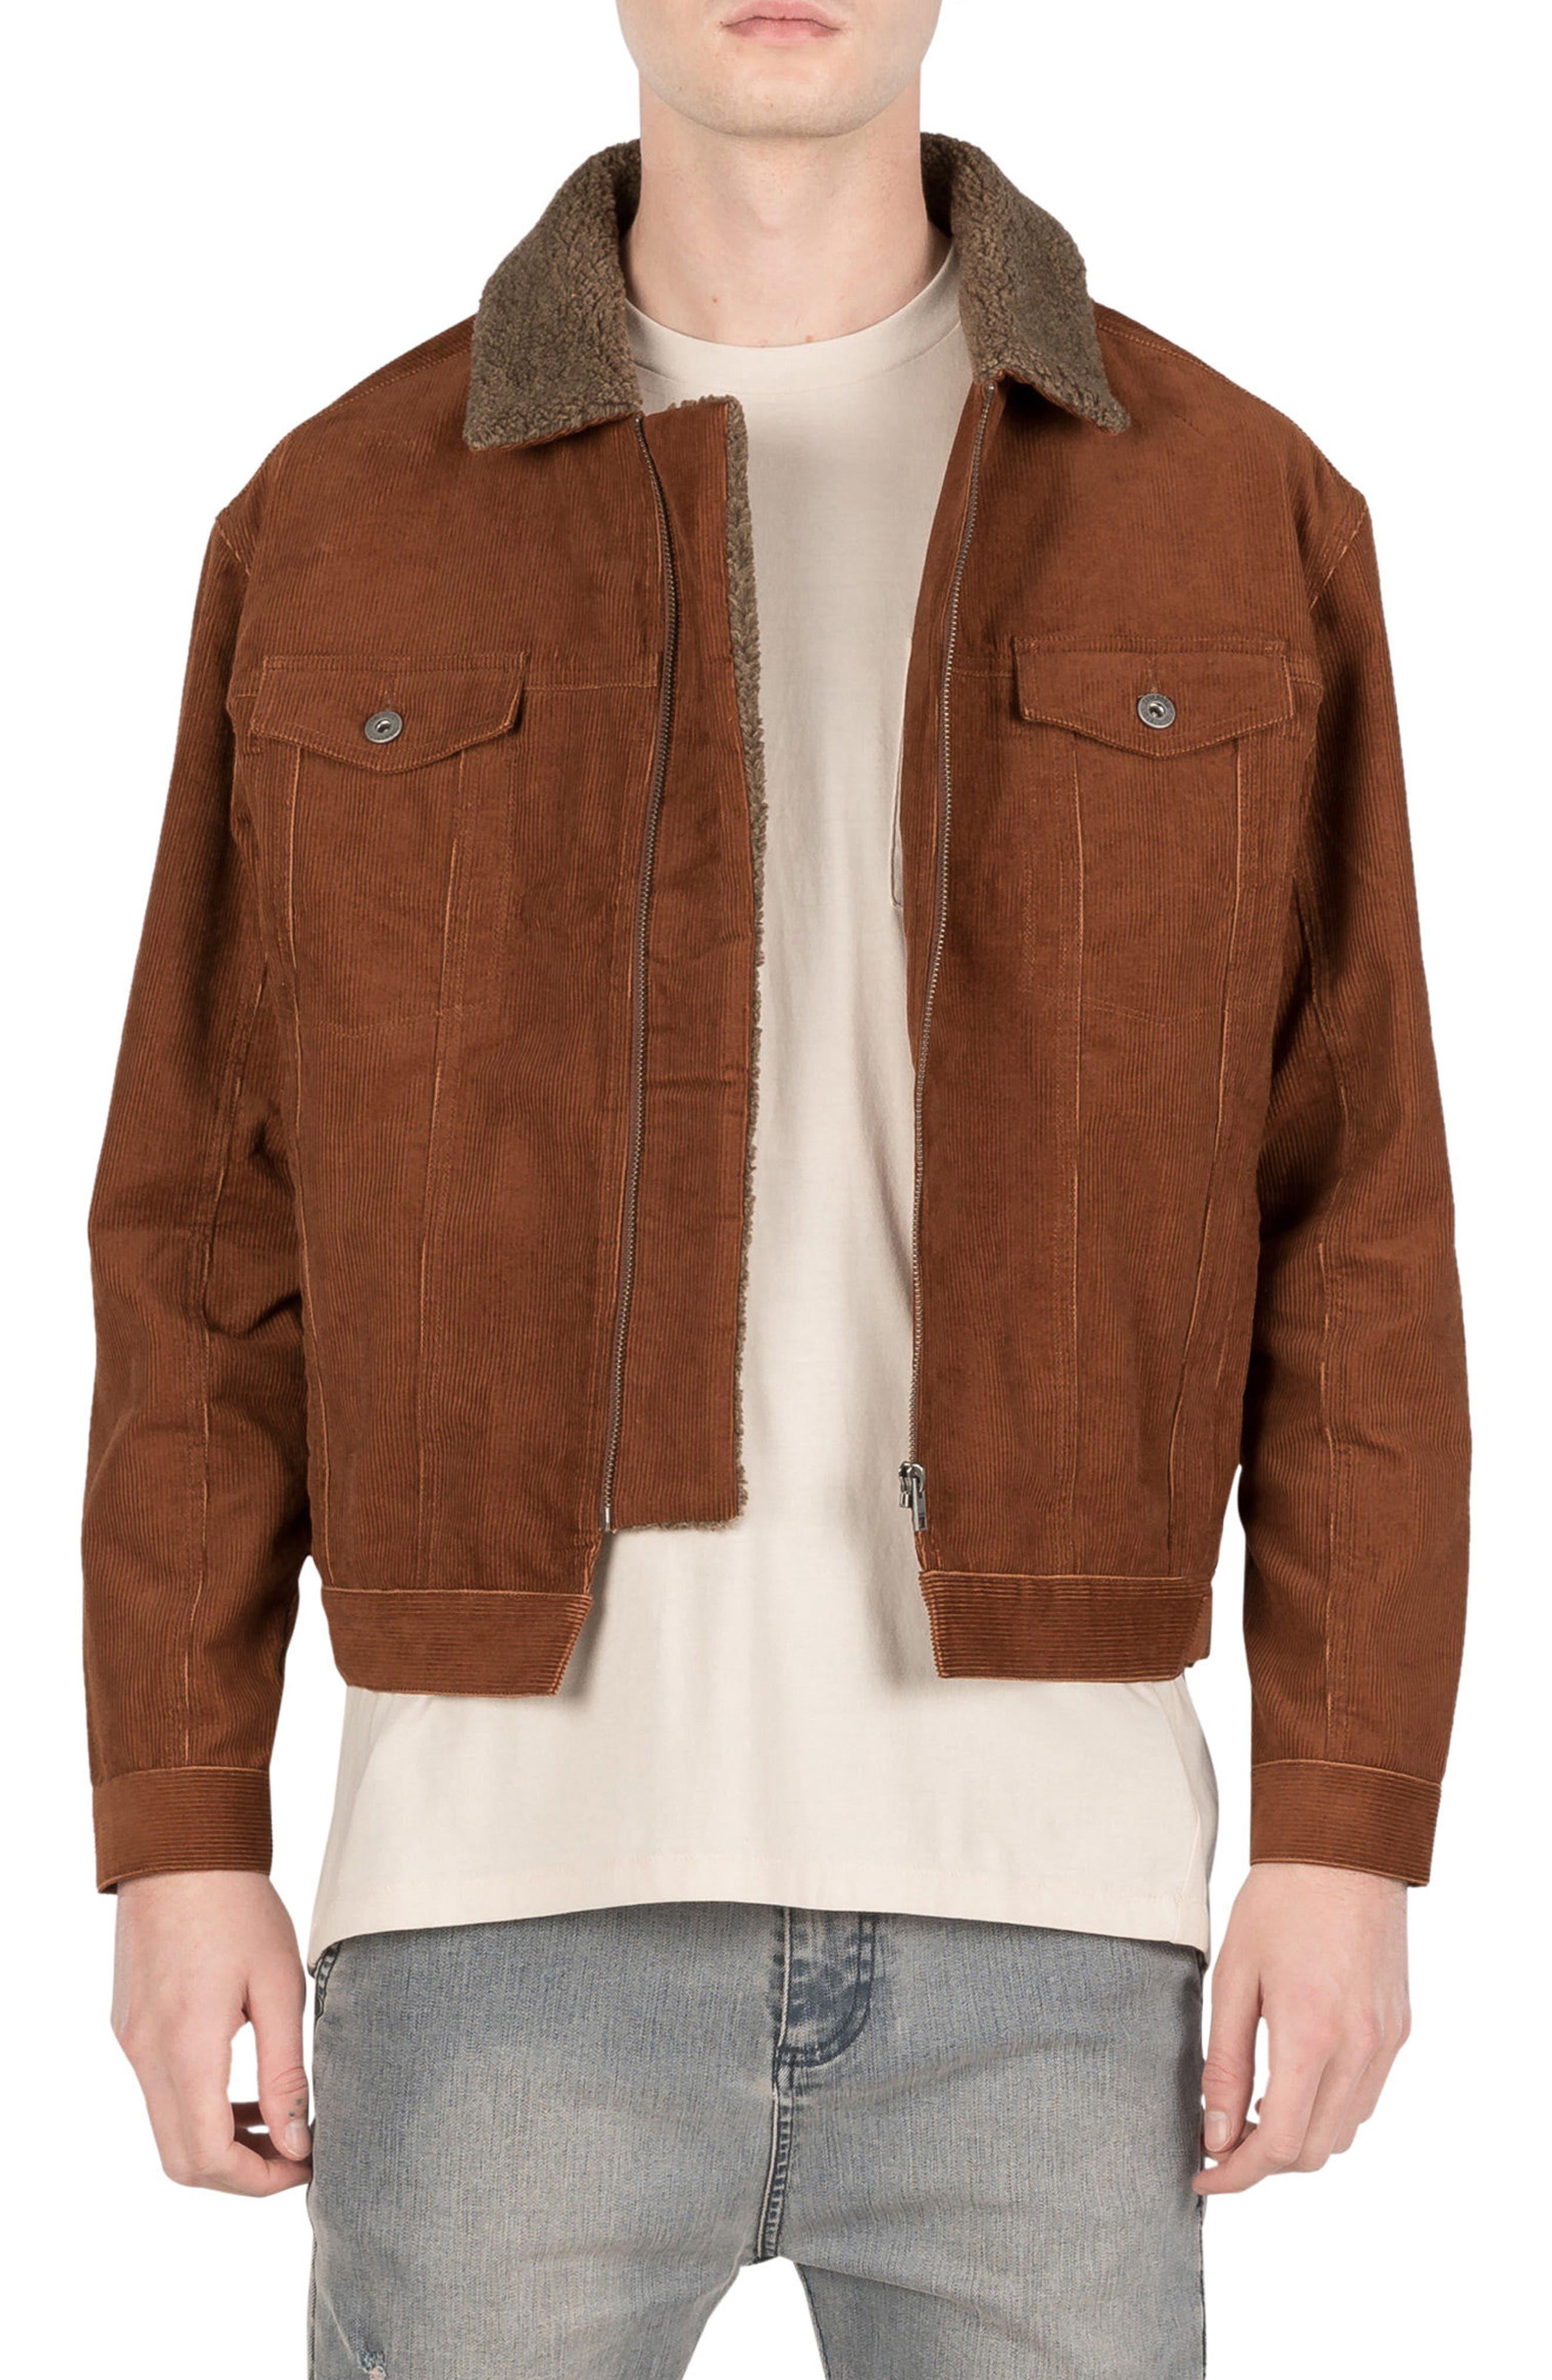 Snitch Corduroy Jacket,                             Main thumbnail 1, color,                             Dark Bronze